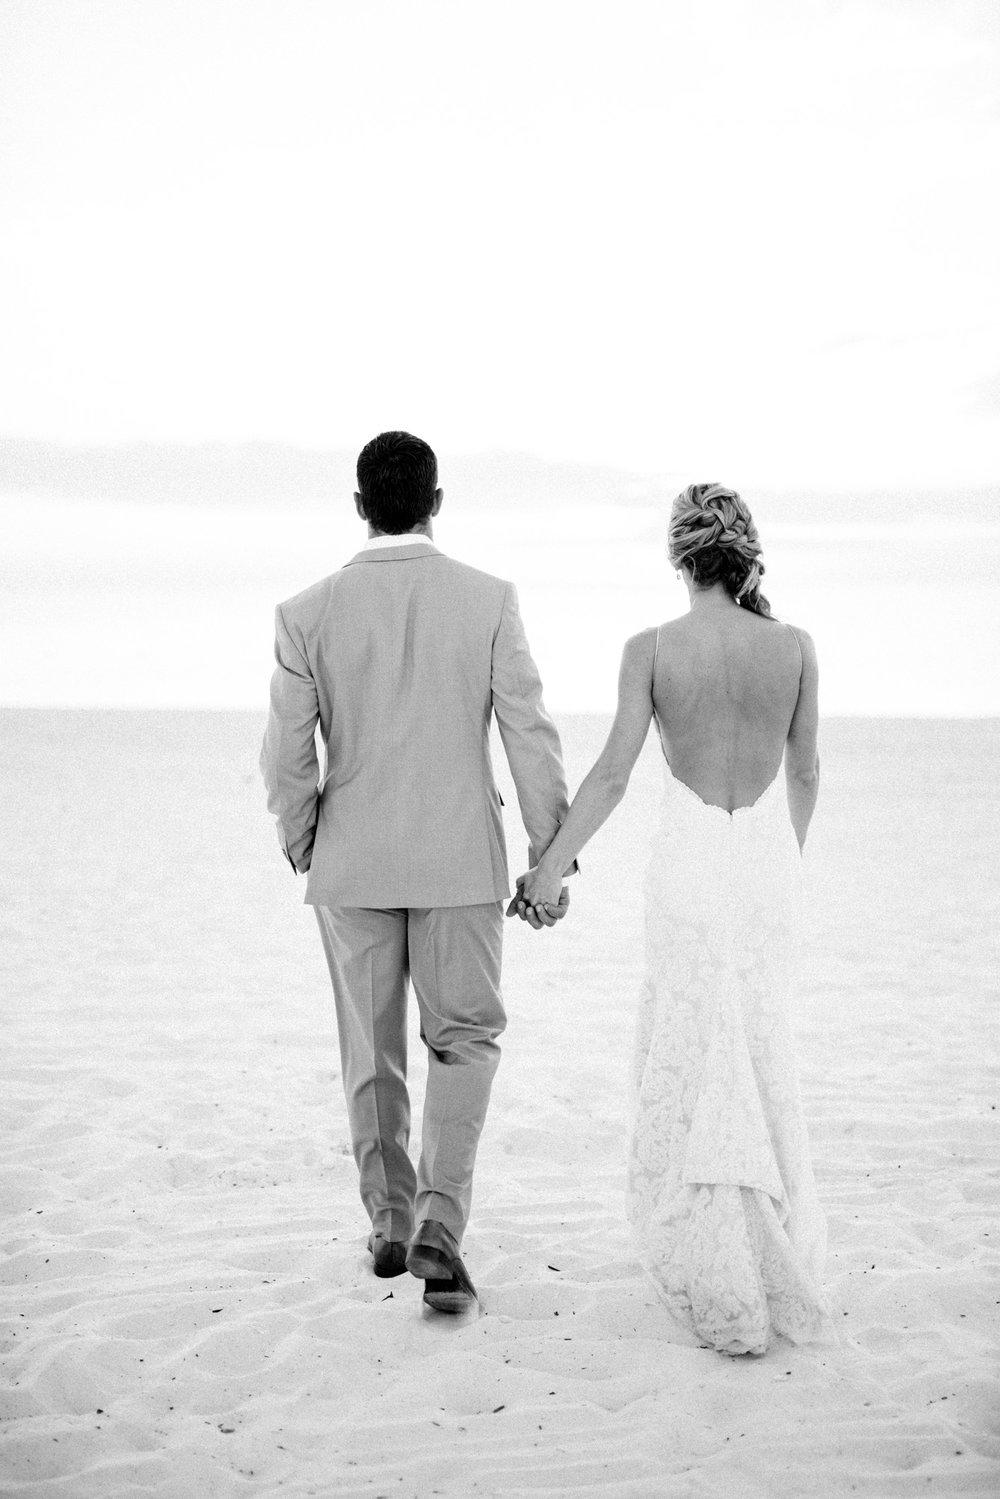 marco-beach-ocean-resort-naples-florida-wedding-photographer-hunter-ryan-photo-06072.jpg